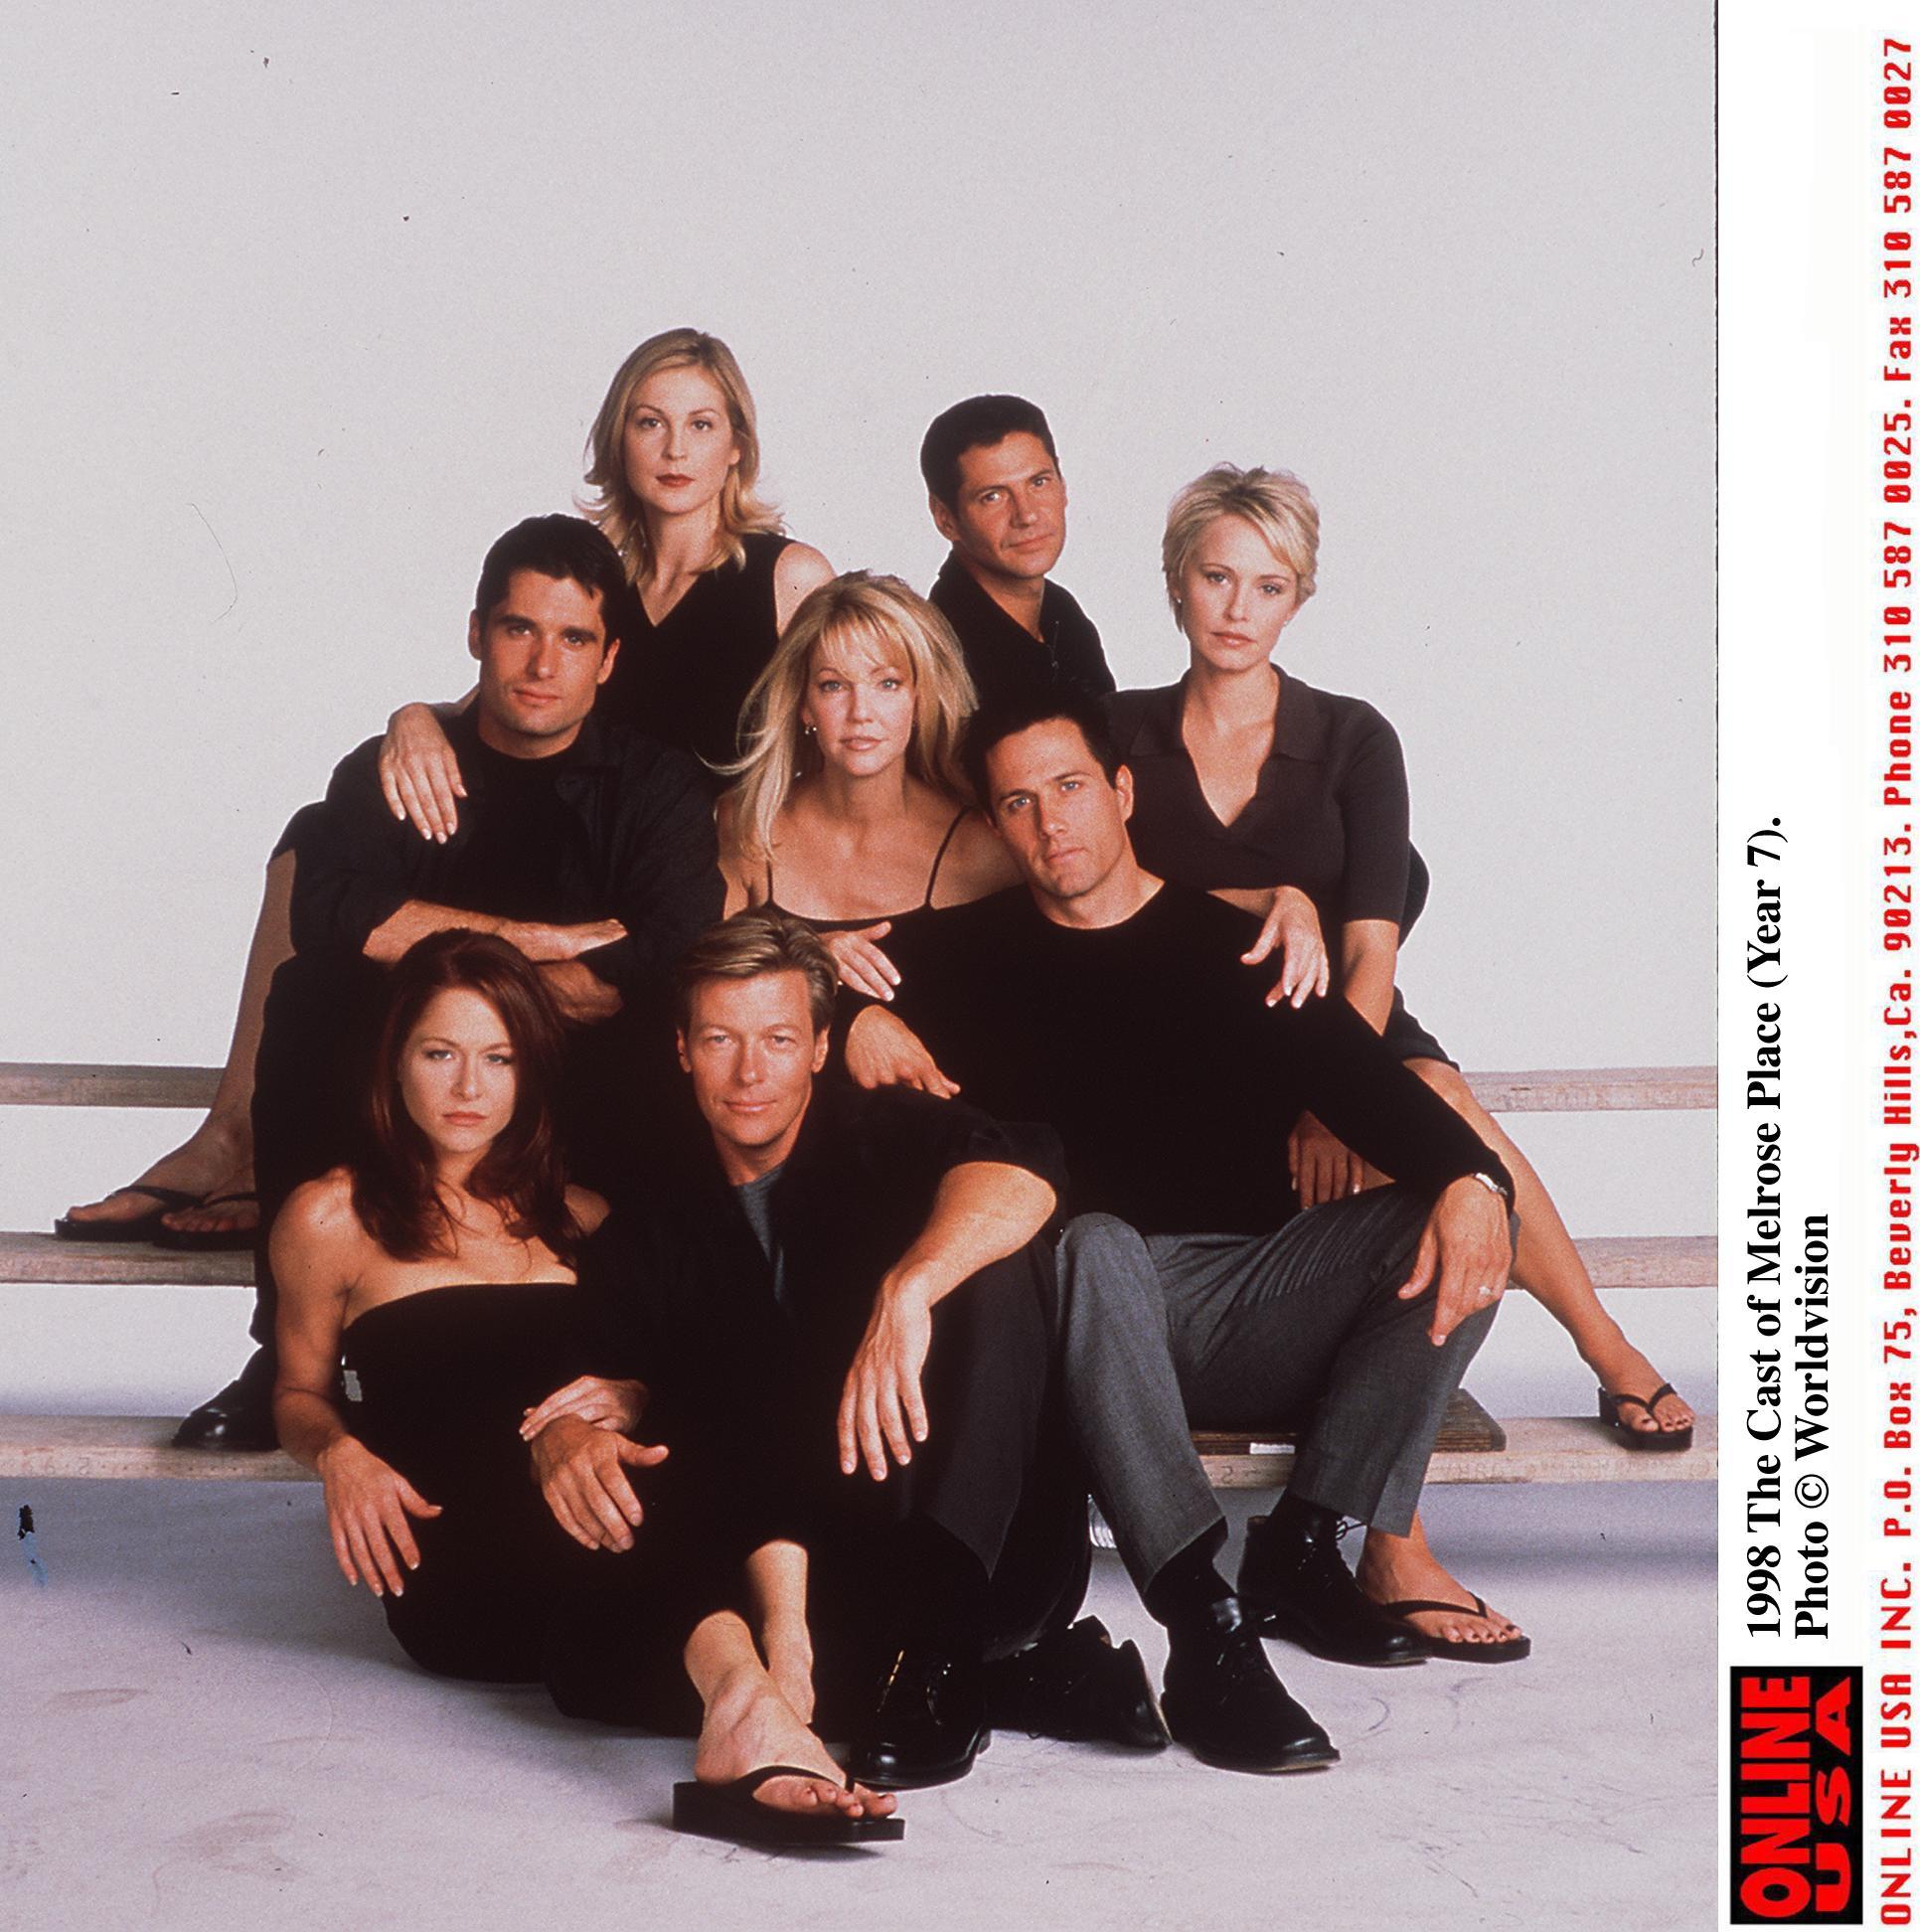 Series Melrose Place: Actors, Roles, Story 37